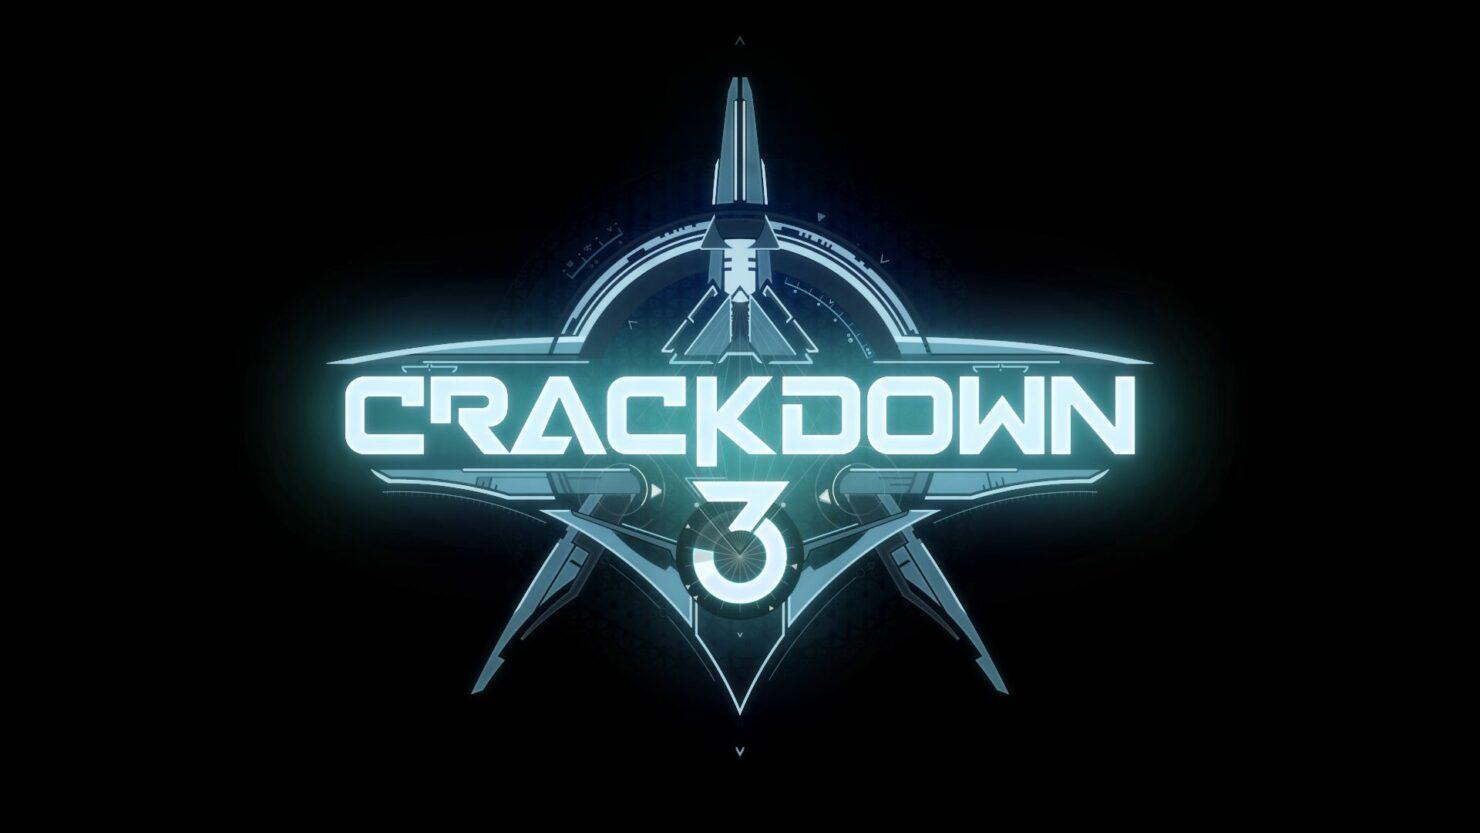 Crackdown 3 Scorpio 4K Holiday 2017